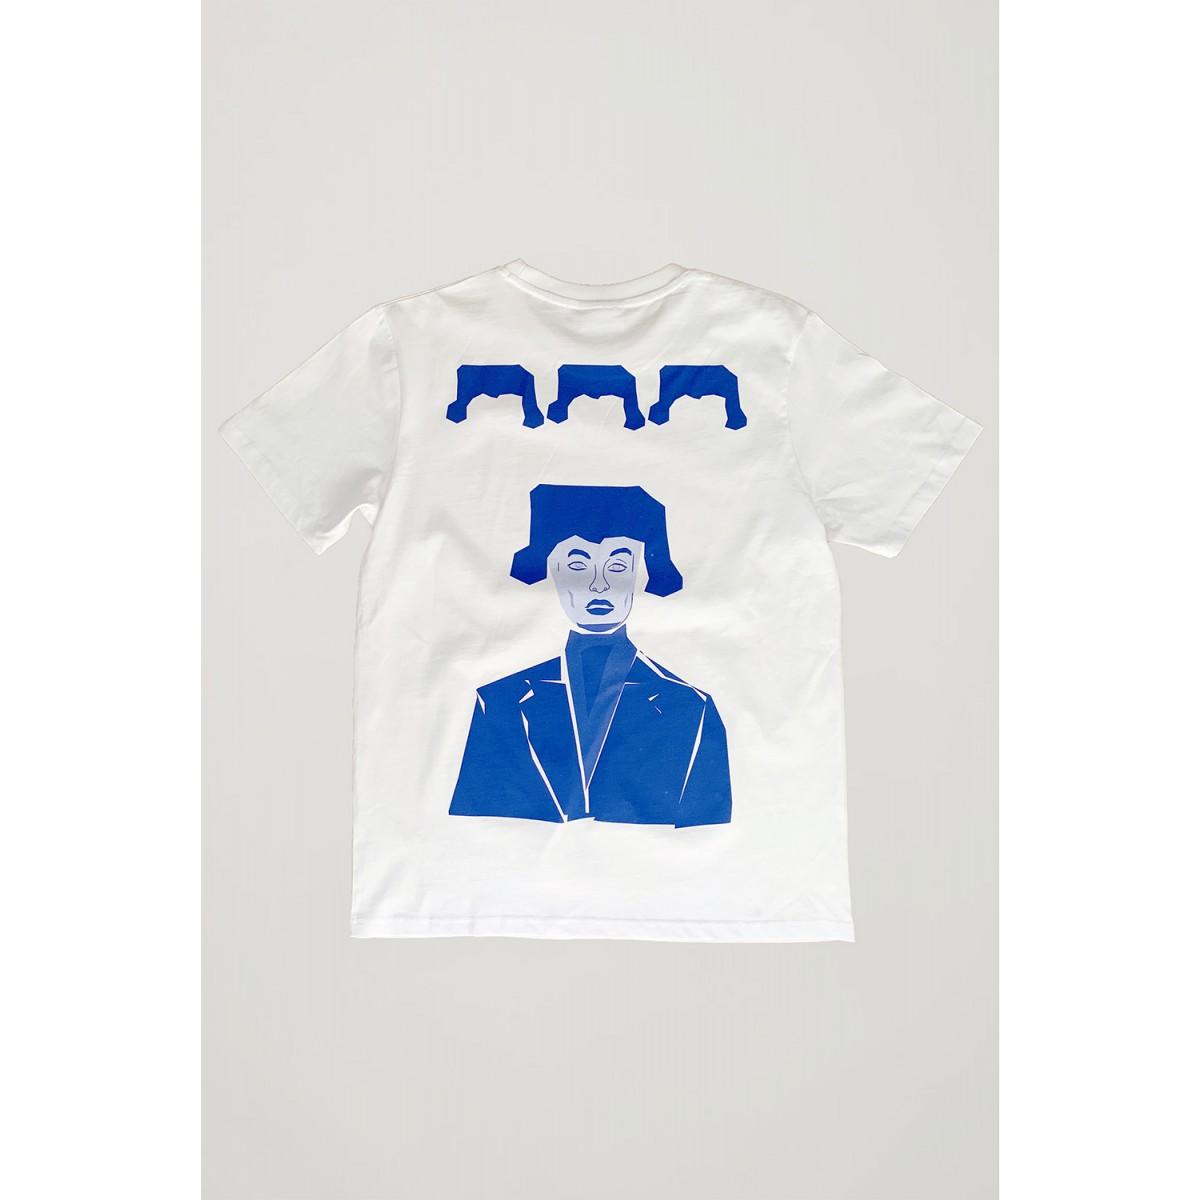 "hey hey ""Three Peruke"" T-Shirt (Limited Edition)"